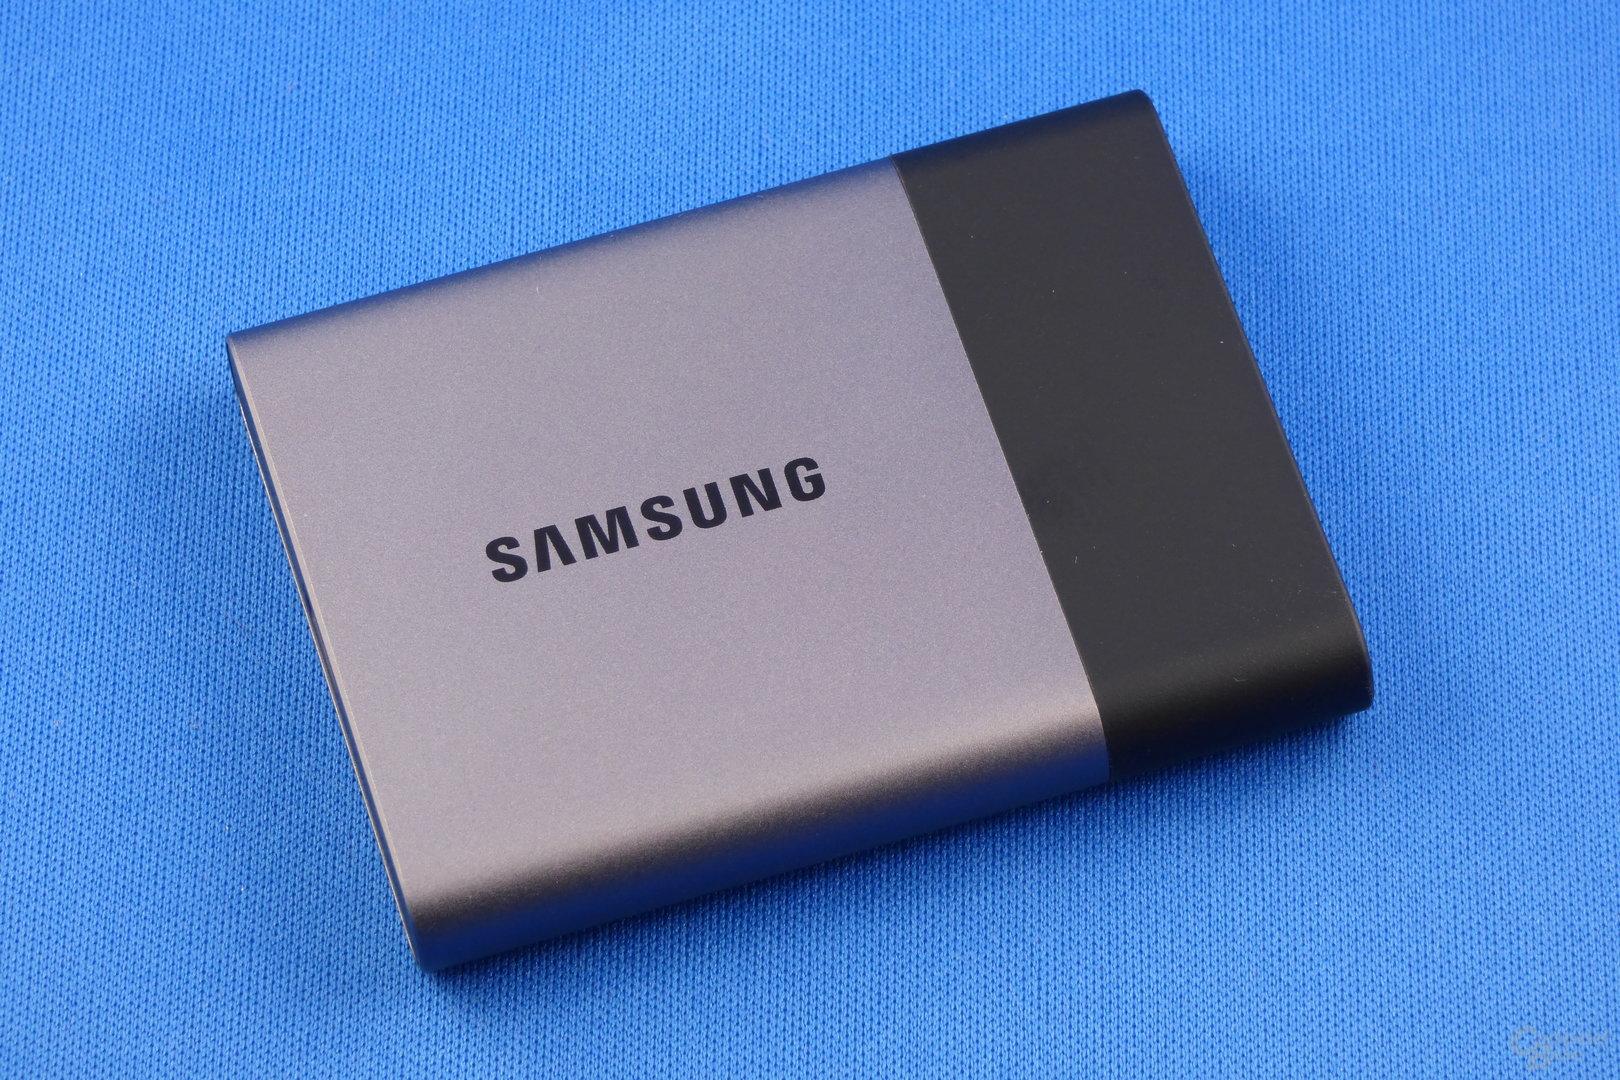 Samsung Portable SSD T3